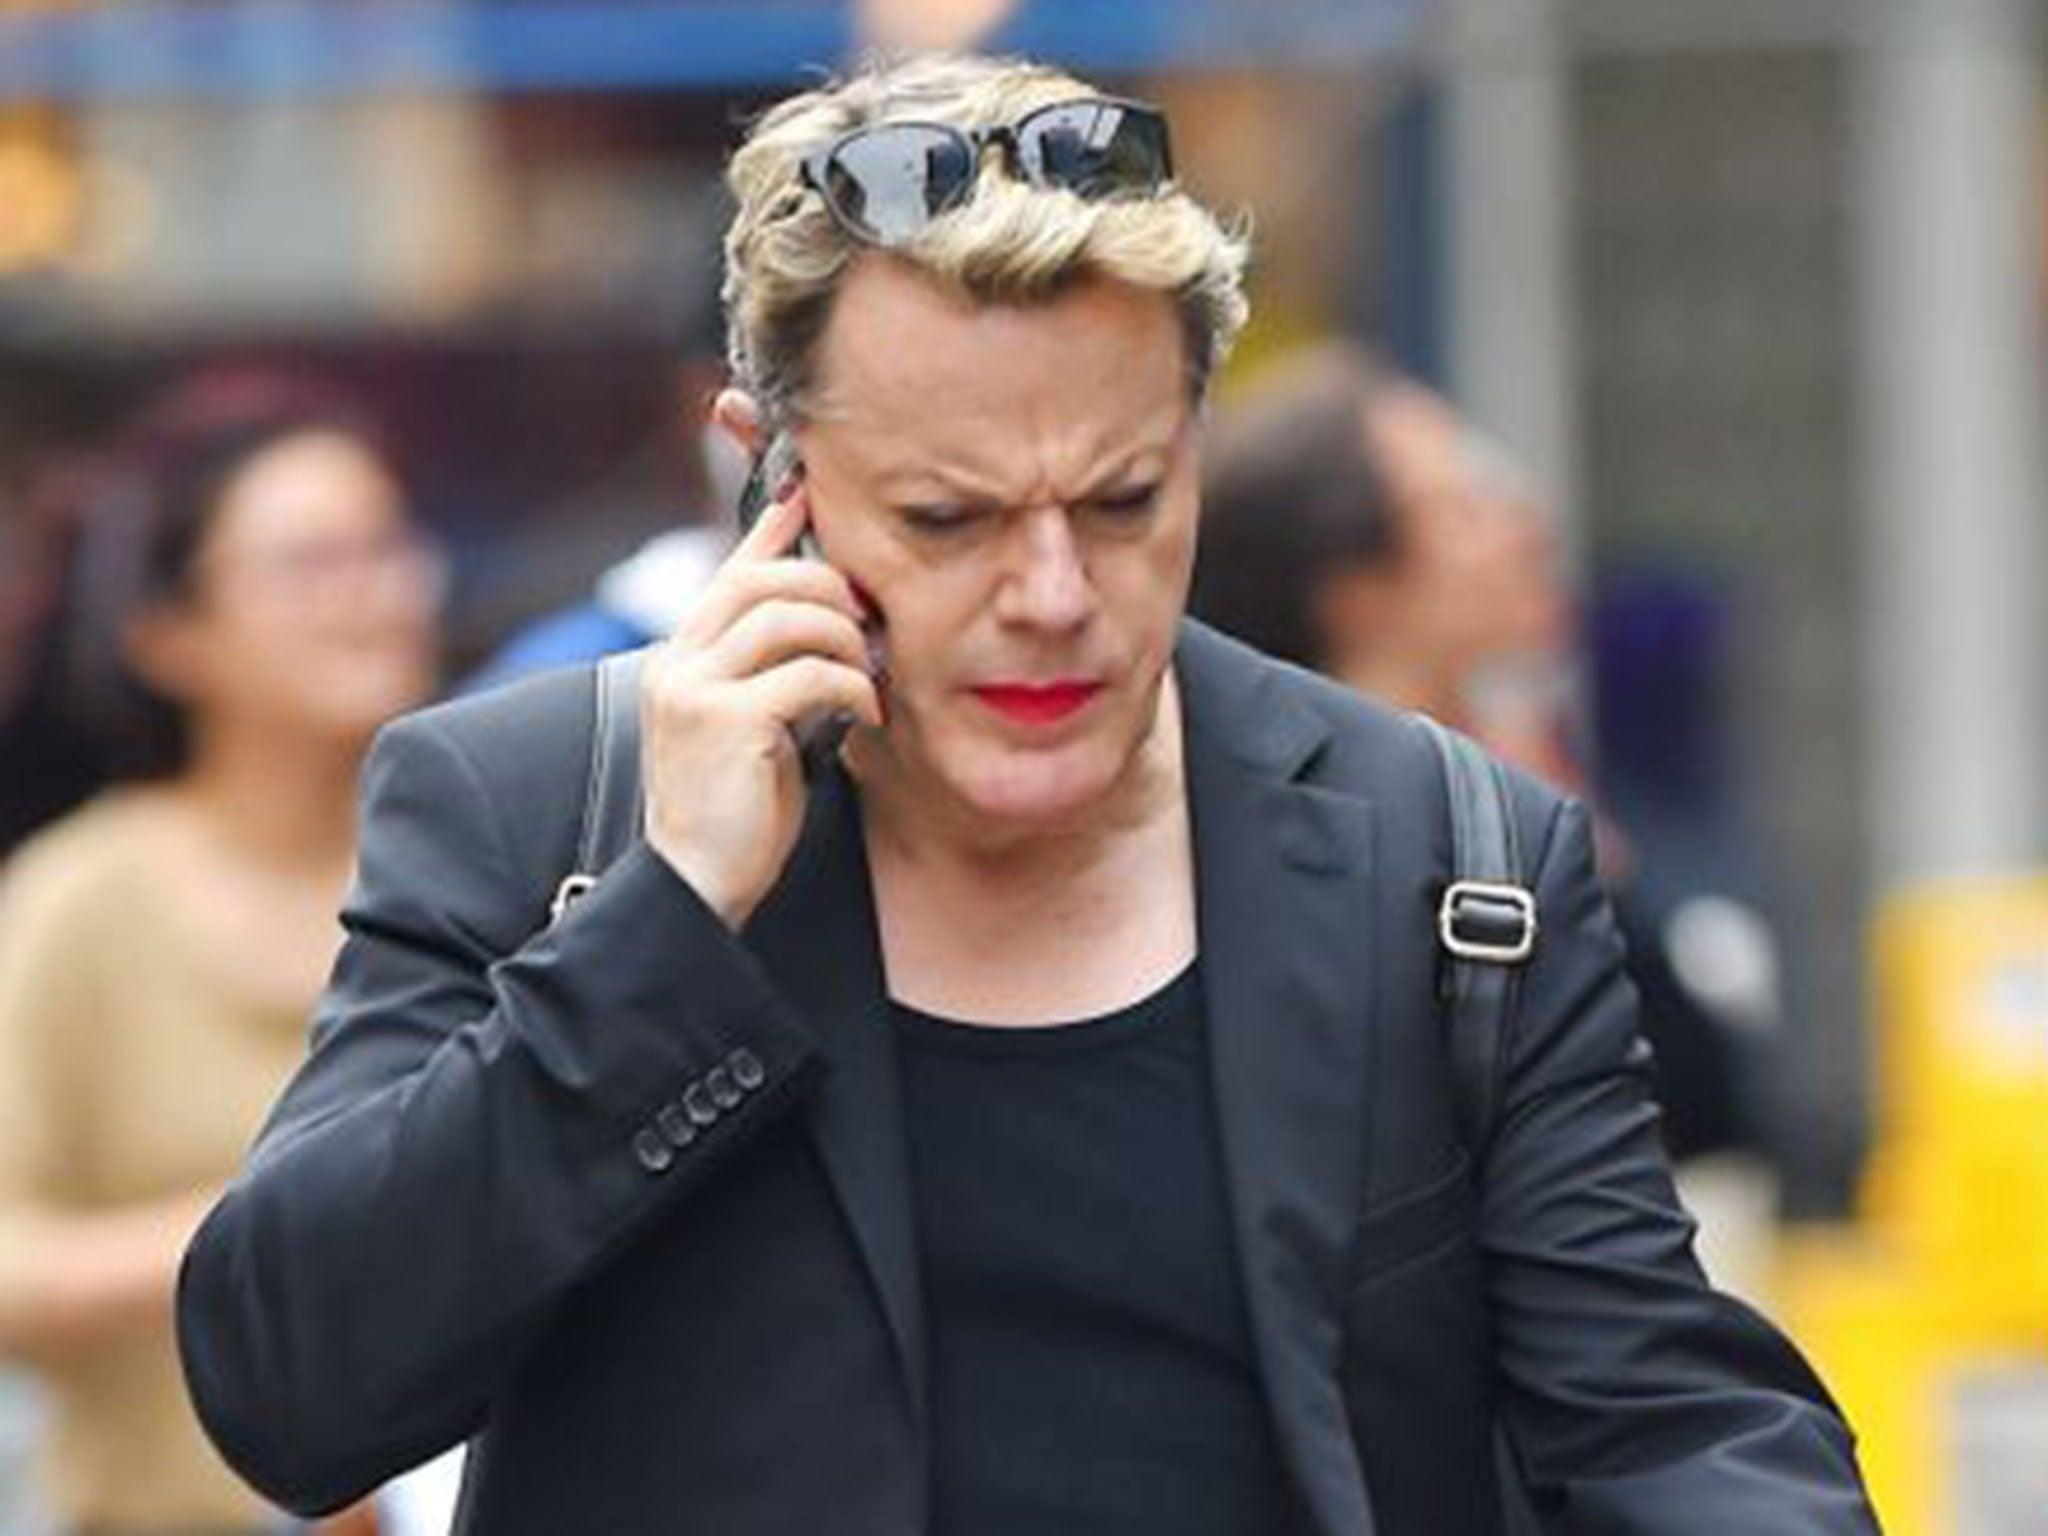 Eddie comedian transvestite british